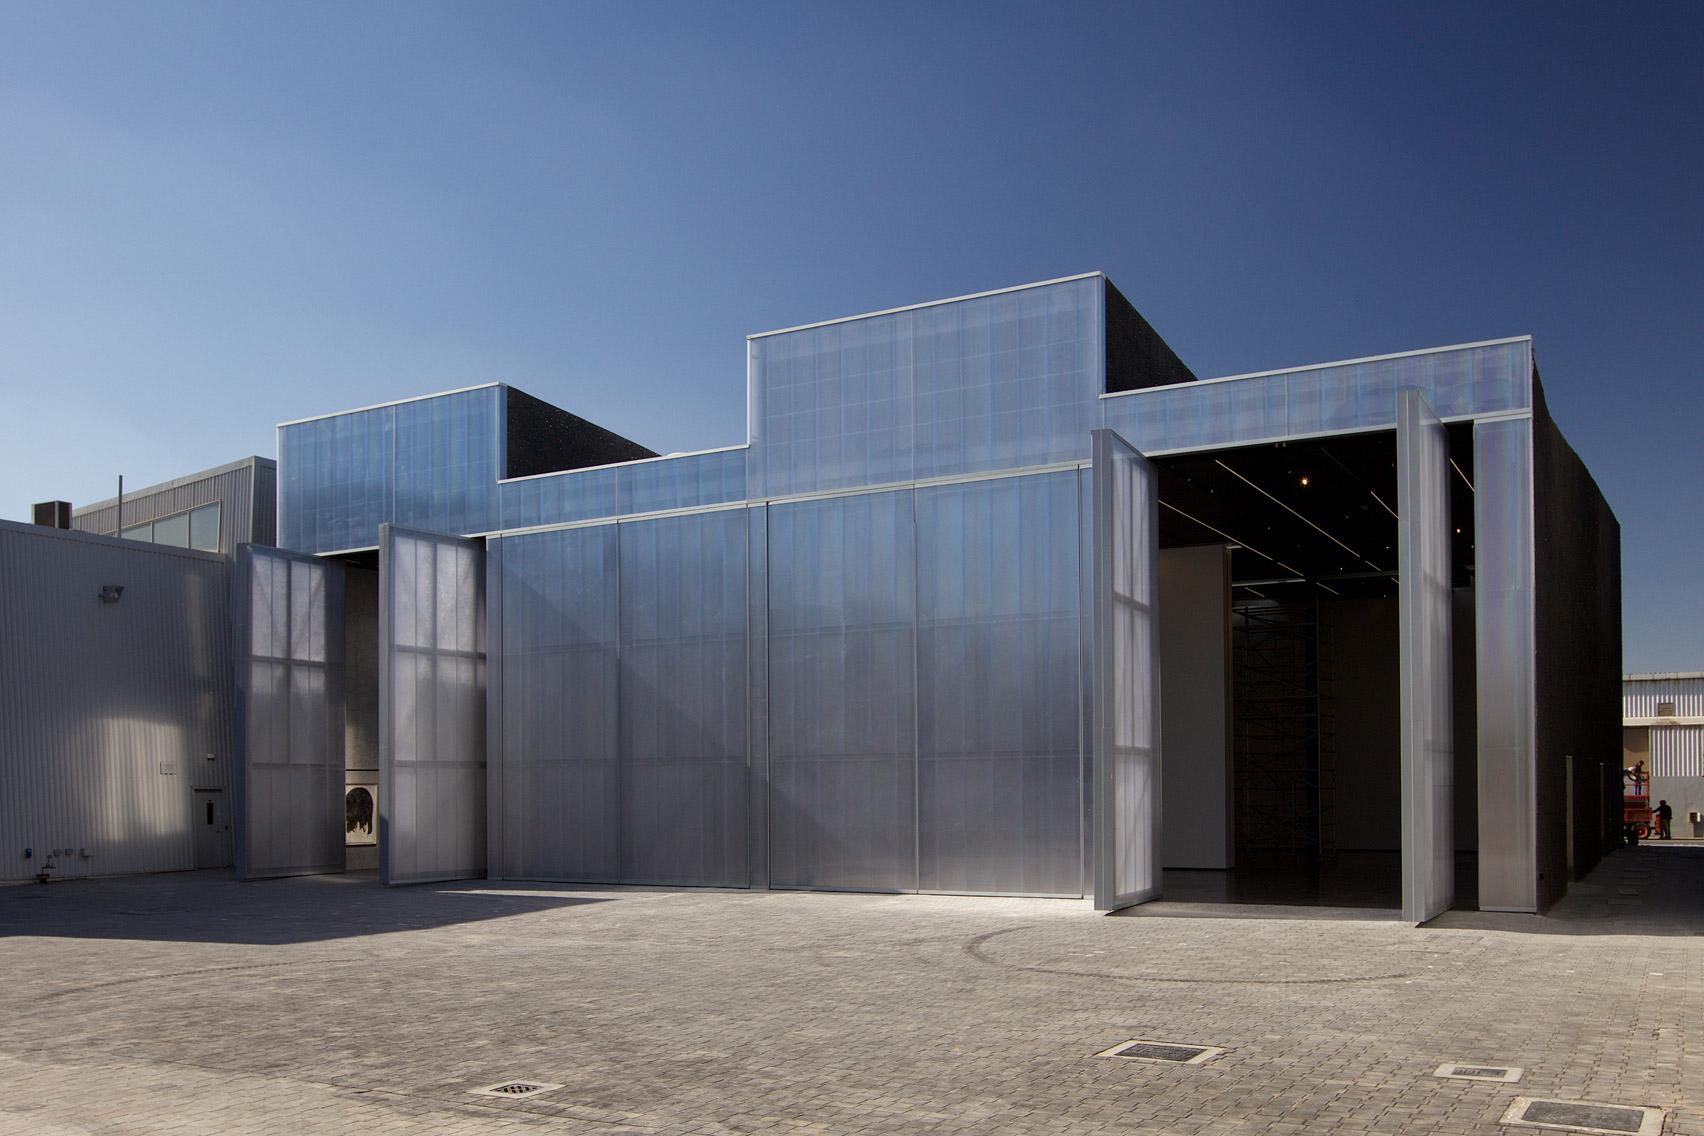 Galeria de arte en Dubai